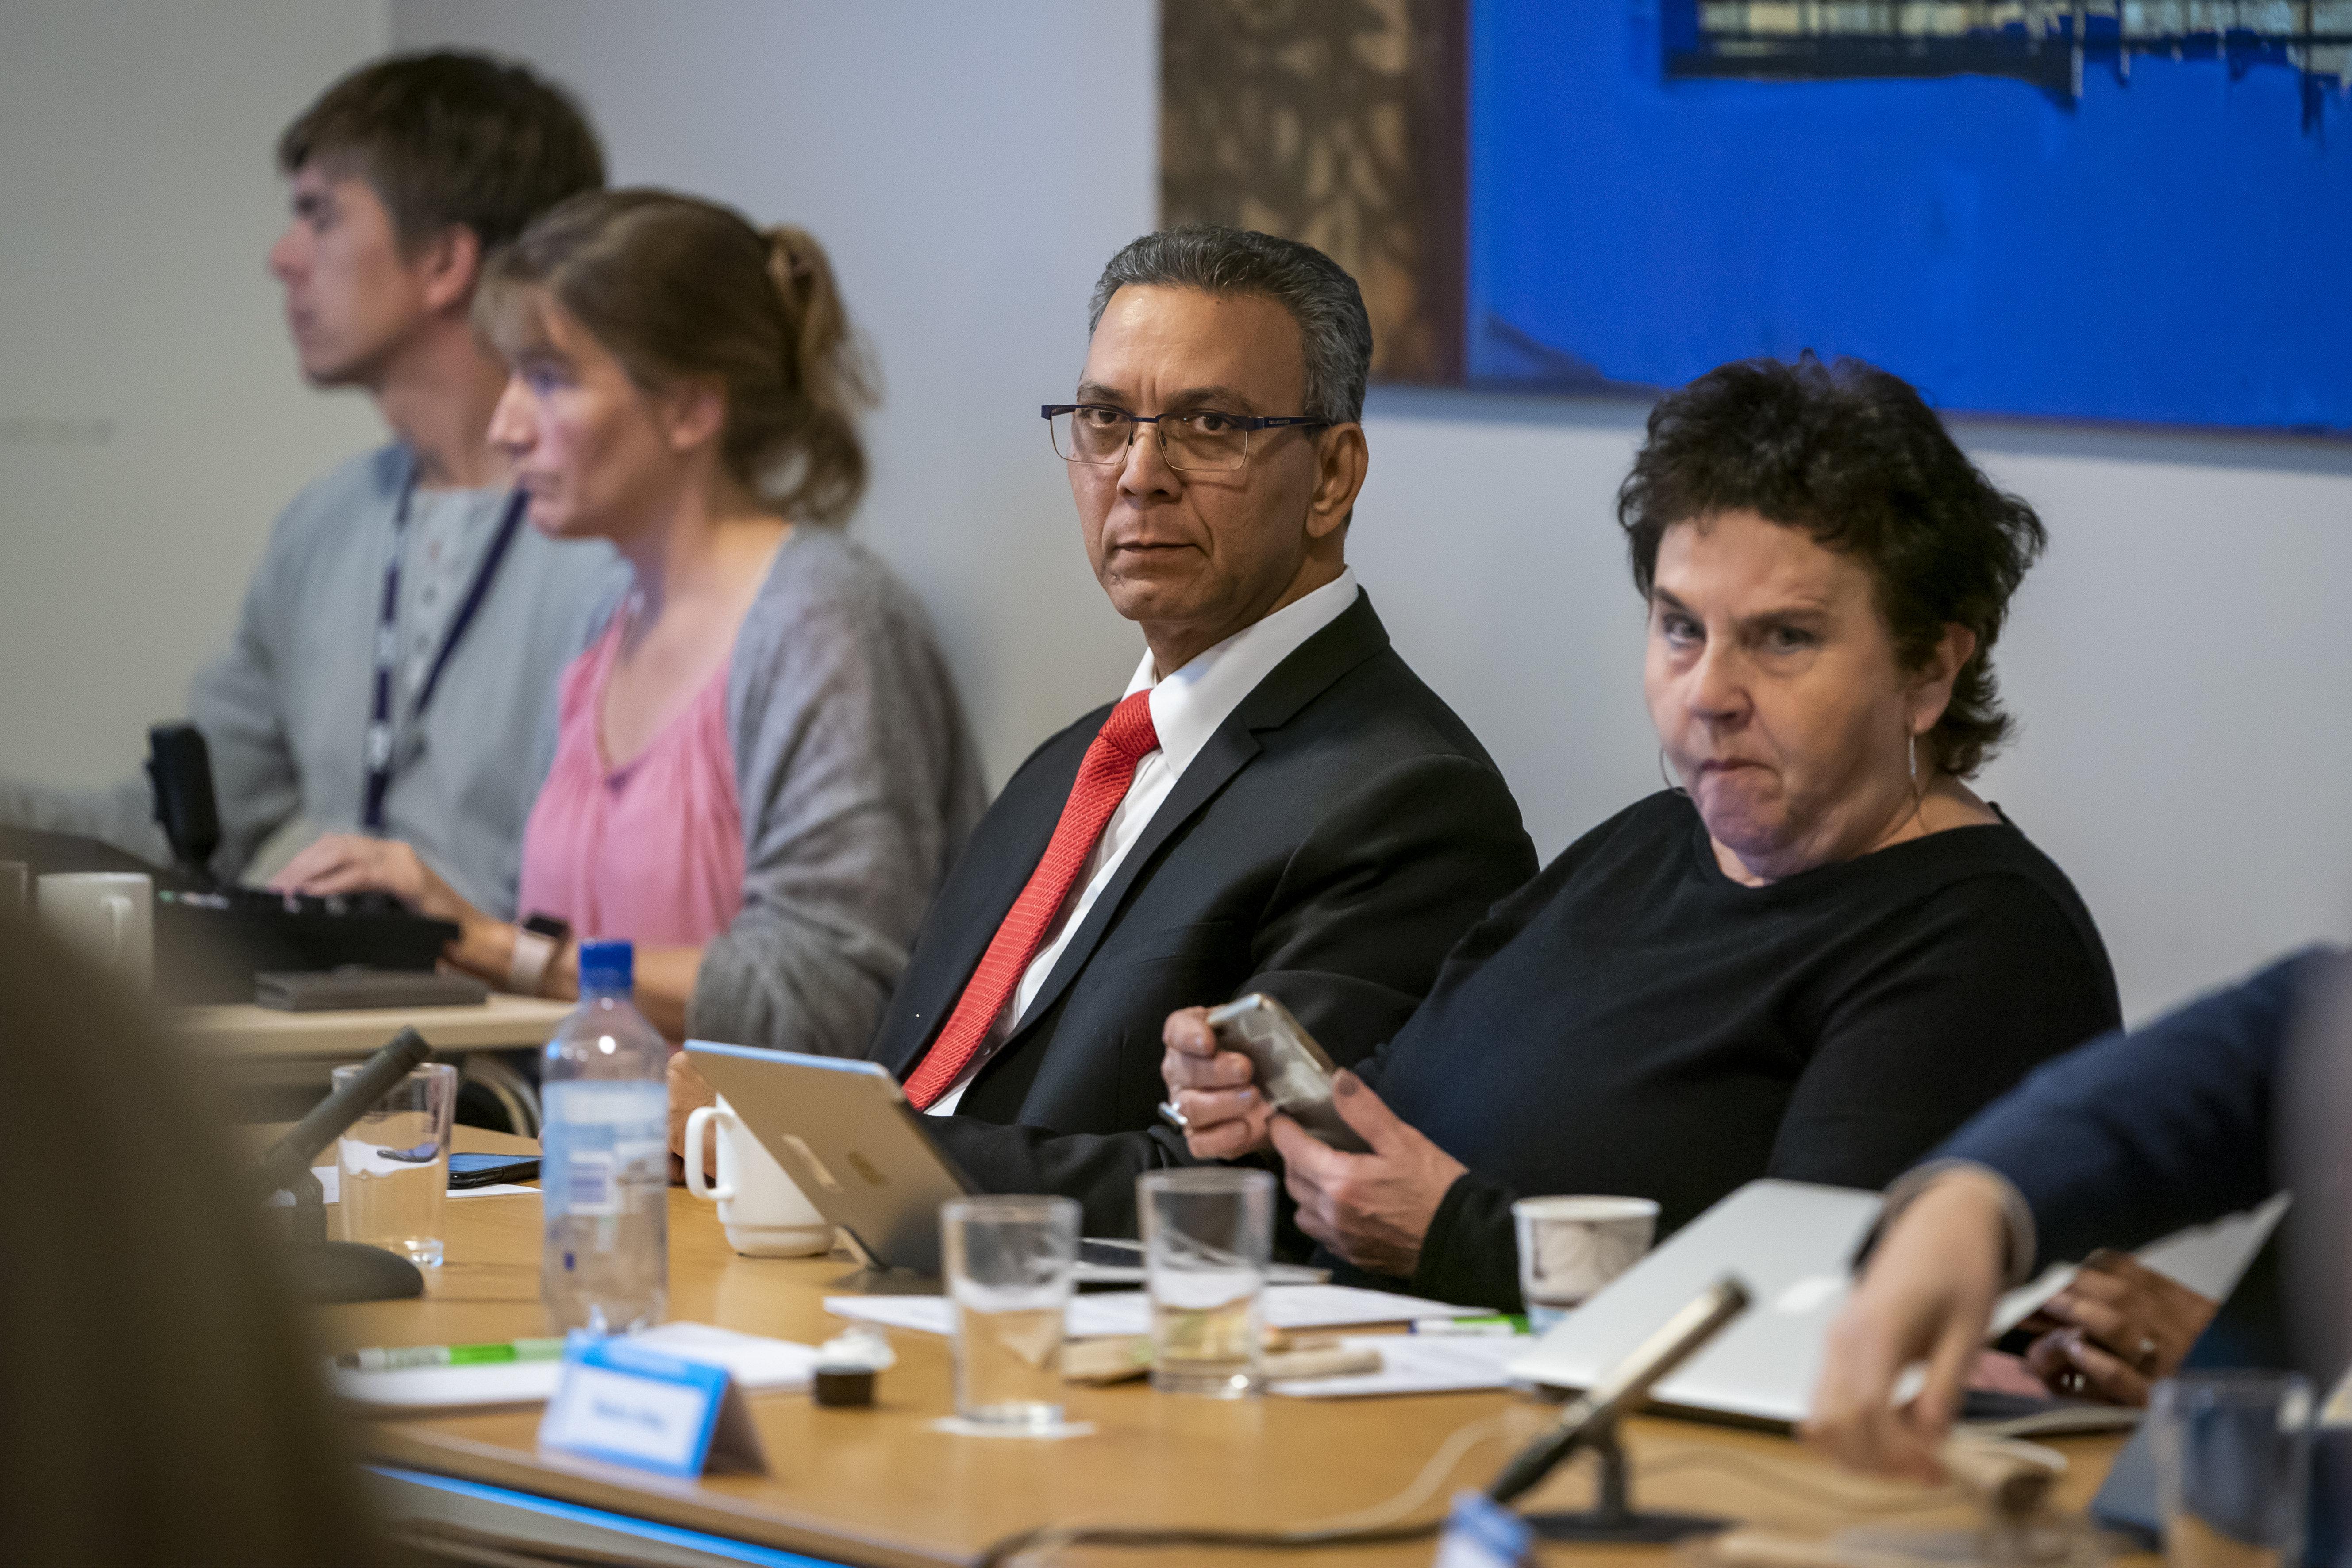 Akhtar Chaudhry, her saman med Tove Karoline Knutsen under møtet i Kringkastingsrådet. Foto: Heiko Junge / NTB scanpix / NPK